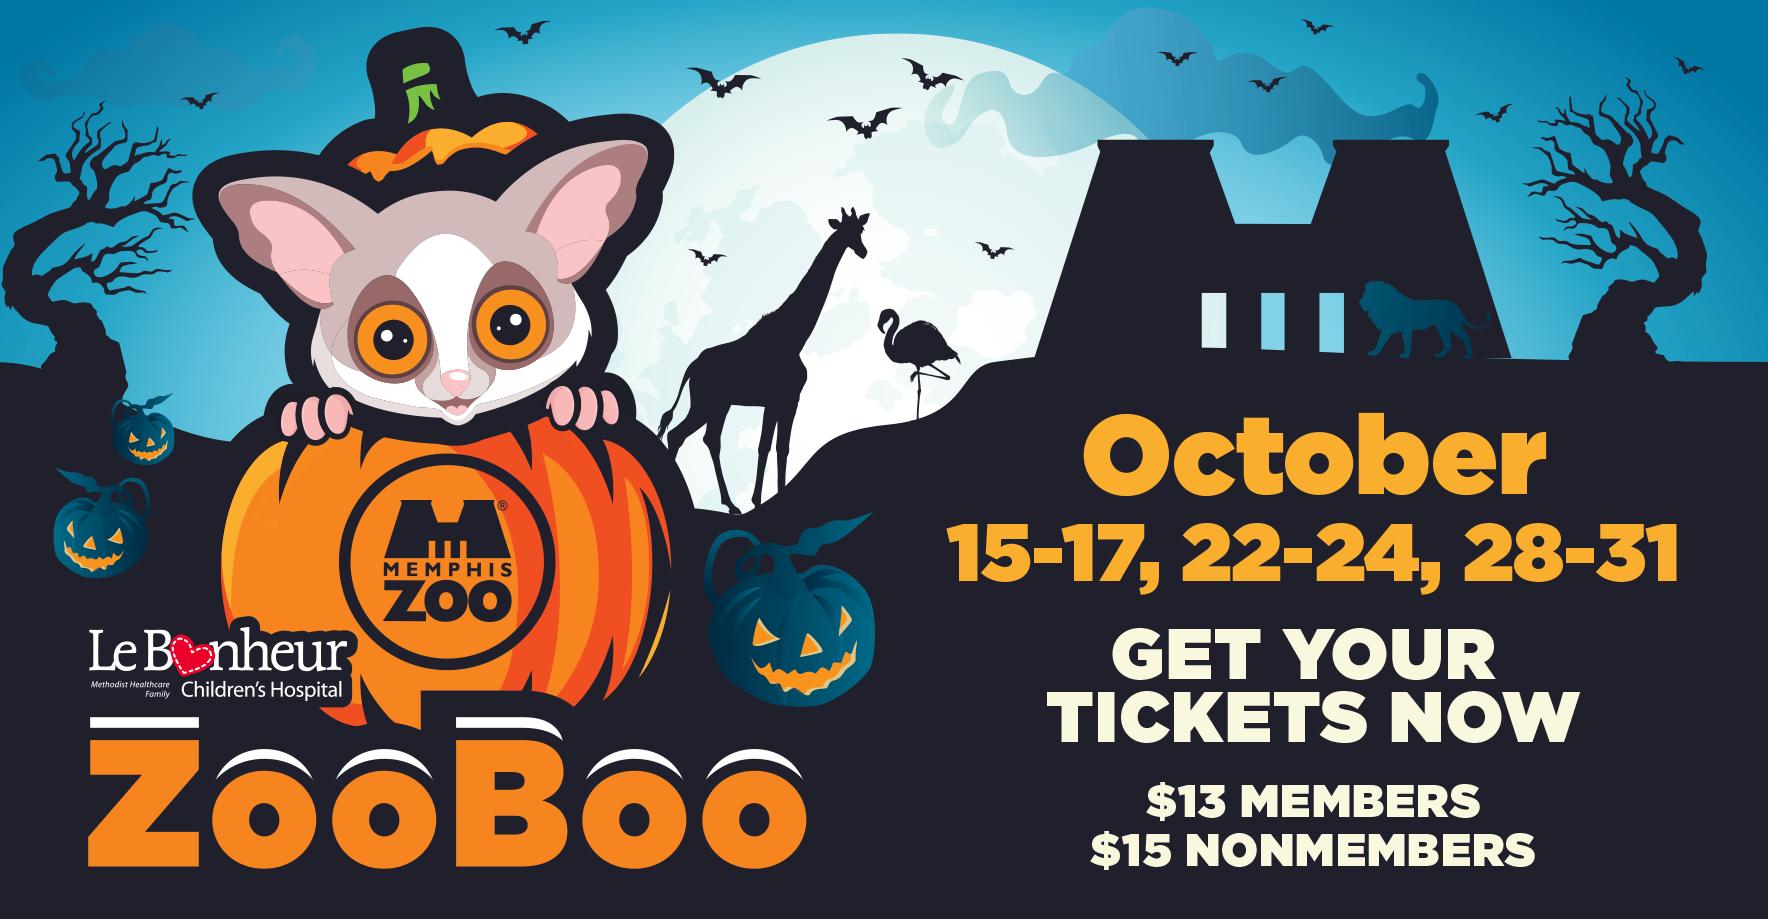 Halloween bushbaby in a jack-o-lantern